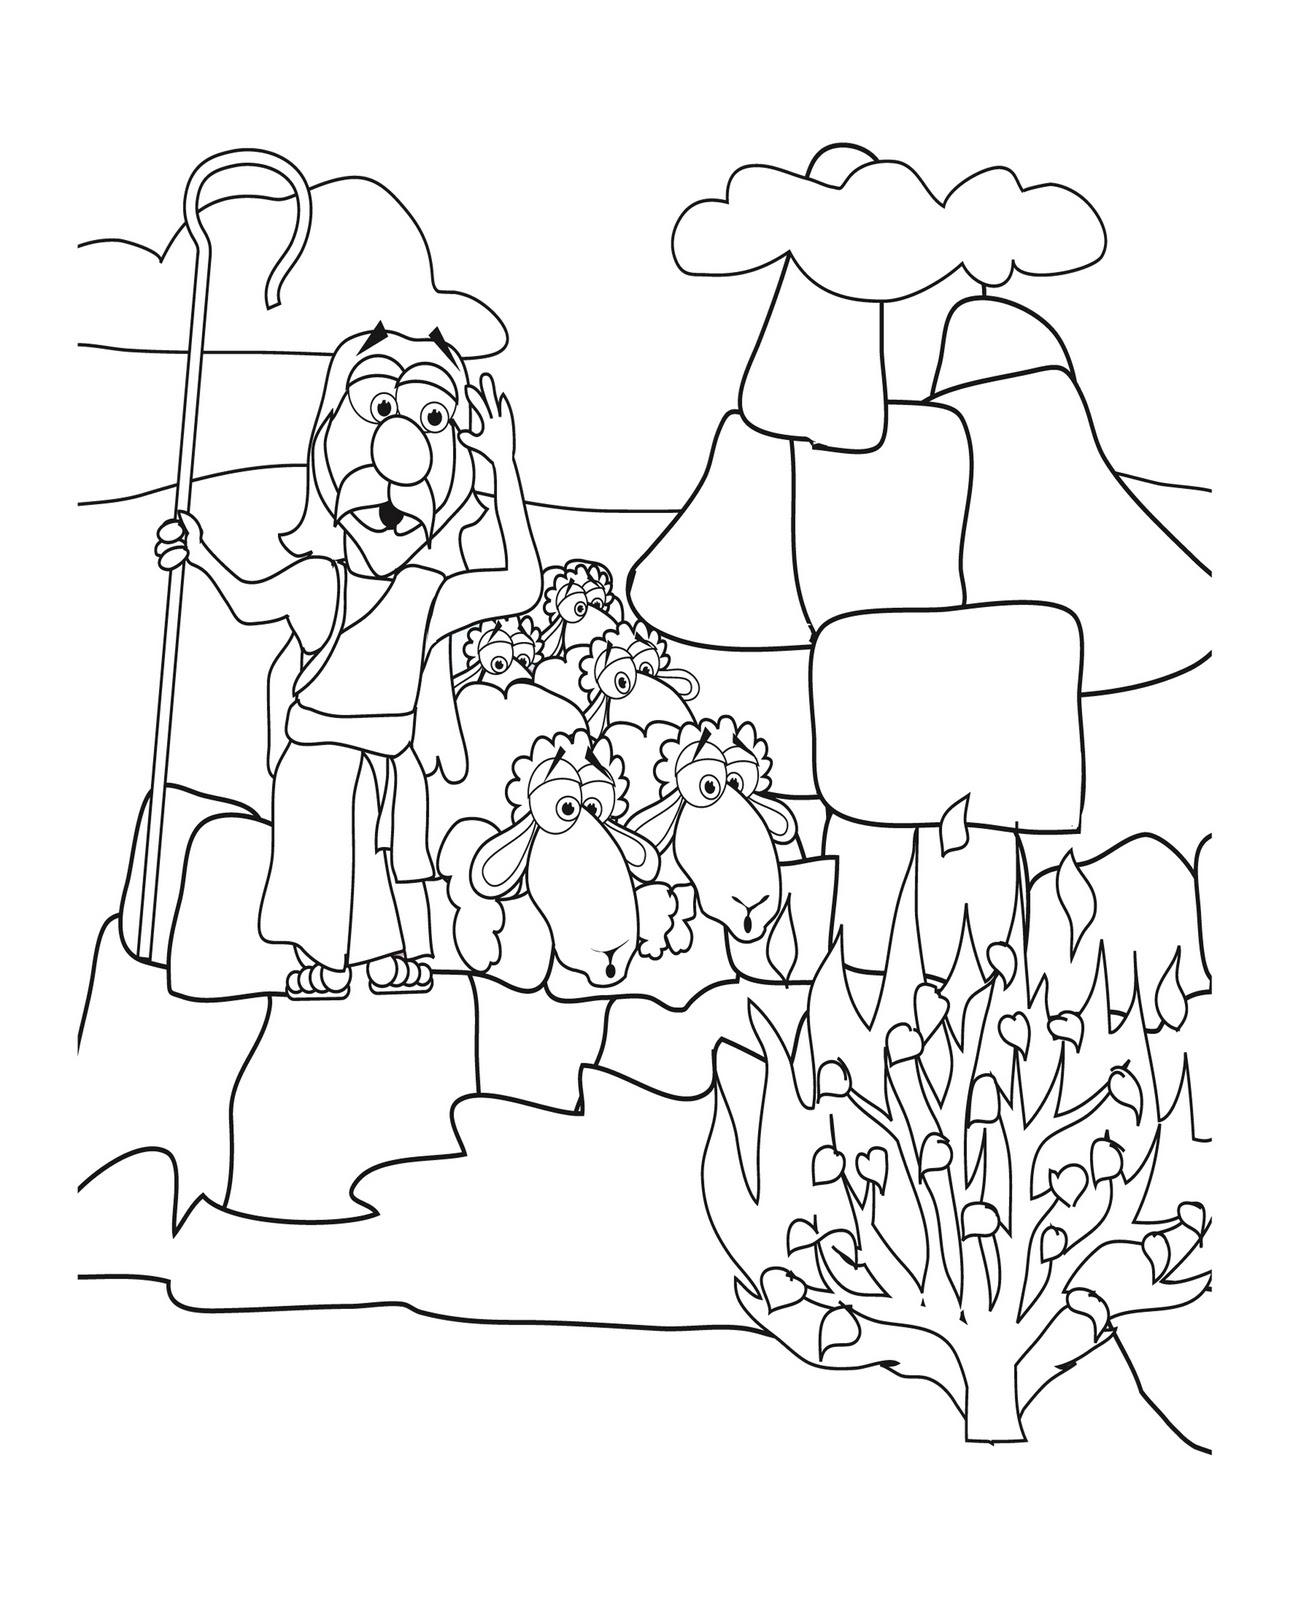 moses coloring sheet mr biblehead moses and the nonburning bush exodus 3 coloring moses sheet